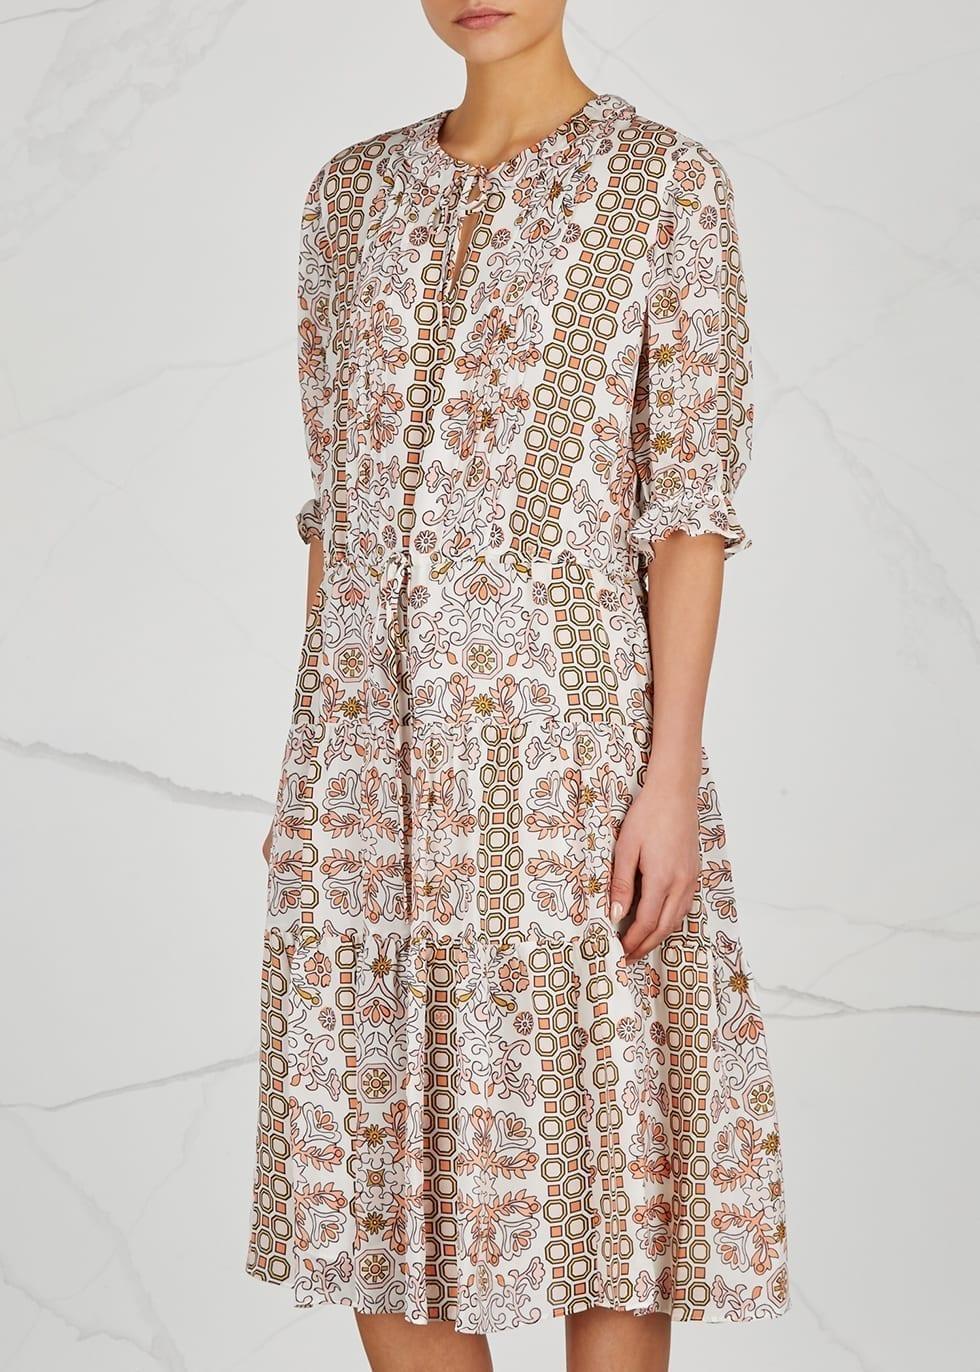 TORY BURCH Serena Silk Chiffon Ivory / Floral Printed Dress